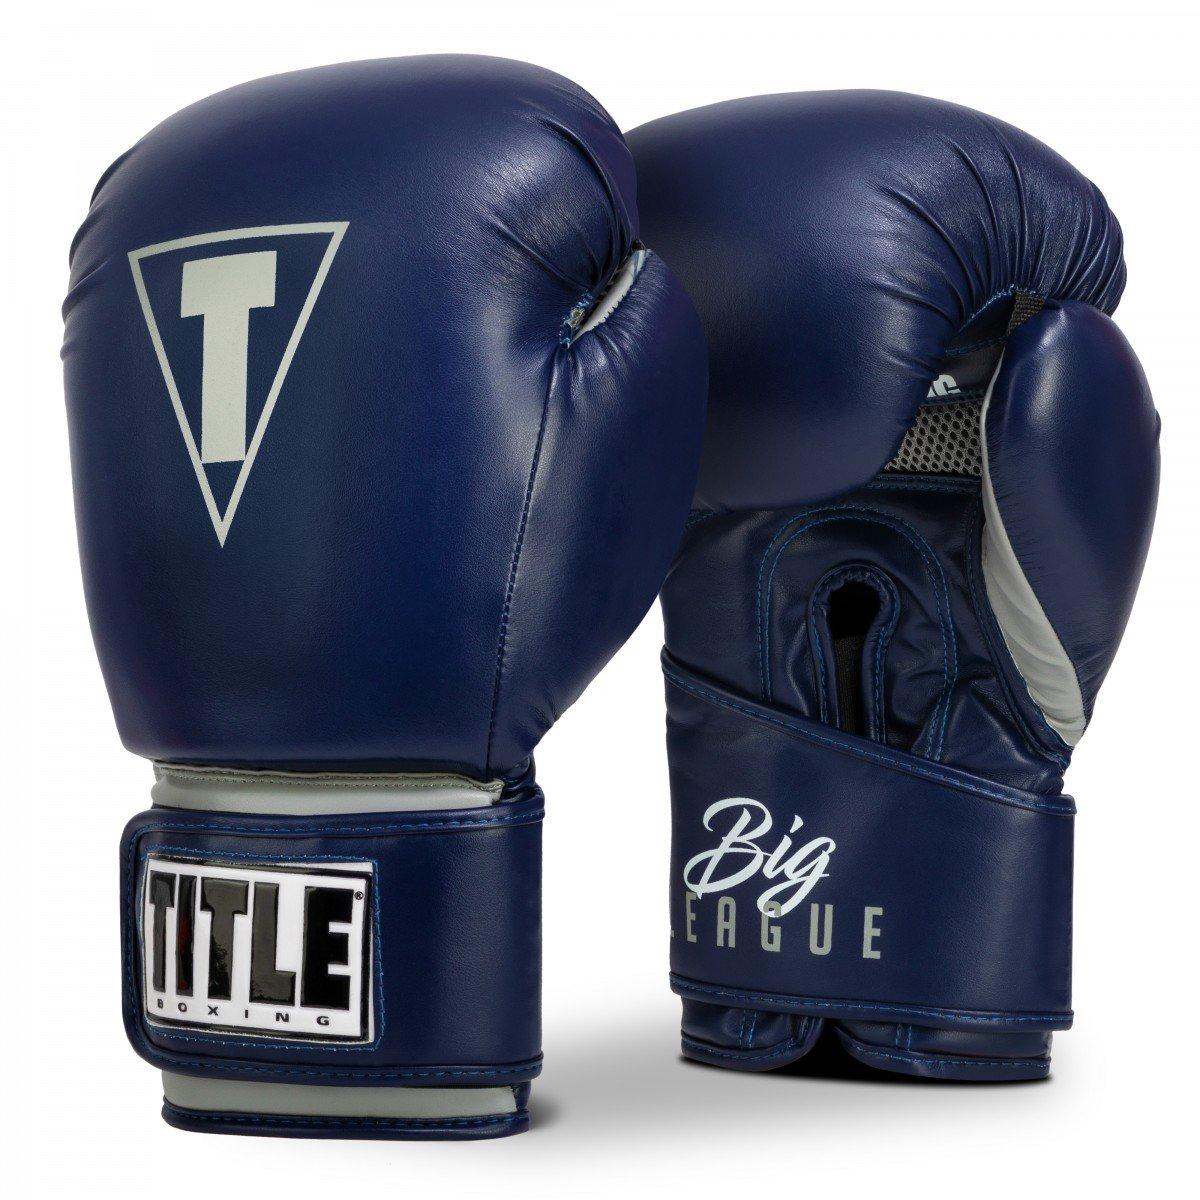 Găng tay boxing Title Big League